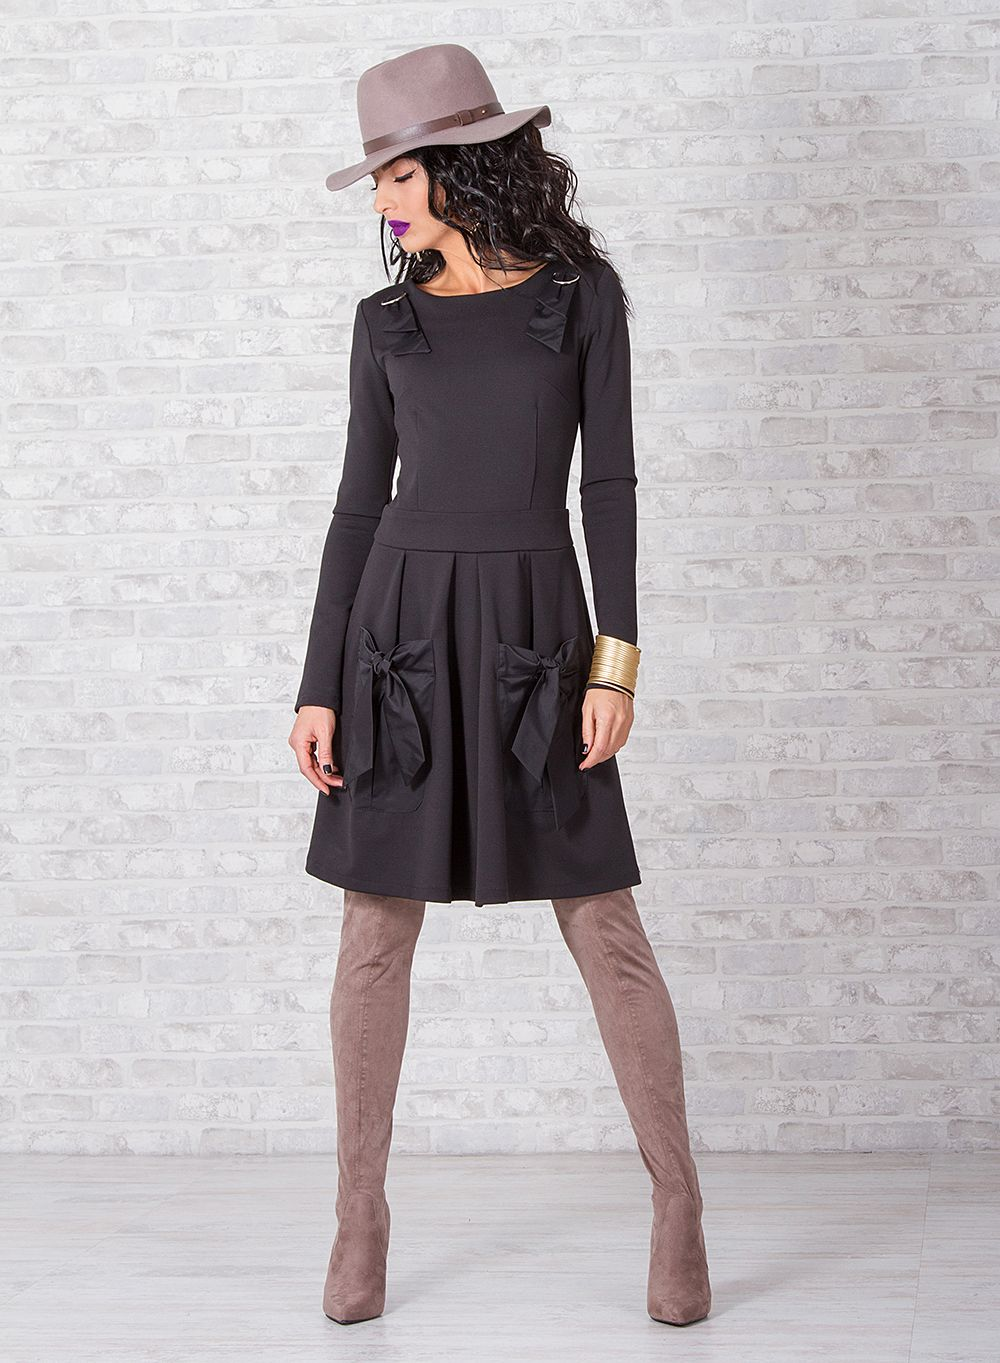 Woman Black Dress Long Sleeve Dress Plus Size Clothing Etsy Womens Black Dress Black Long Sleeve Dress Plus Size Outfits [ 1363 x 1000 Pixel ]